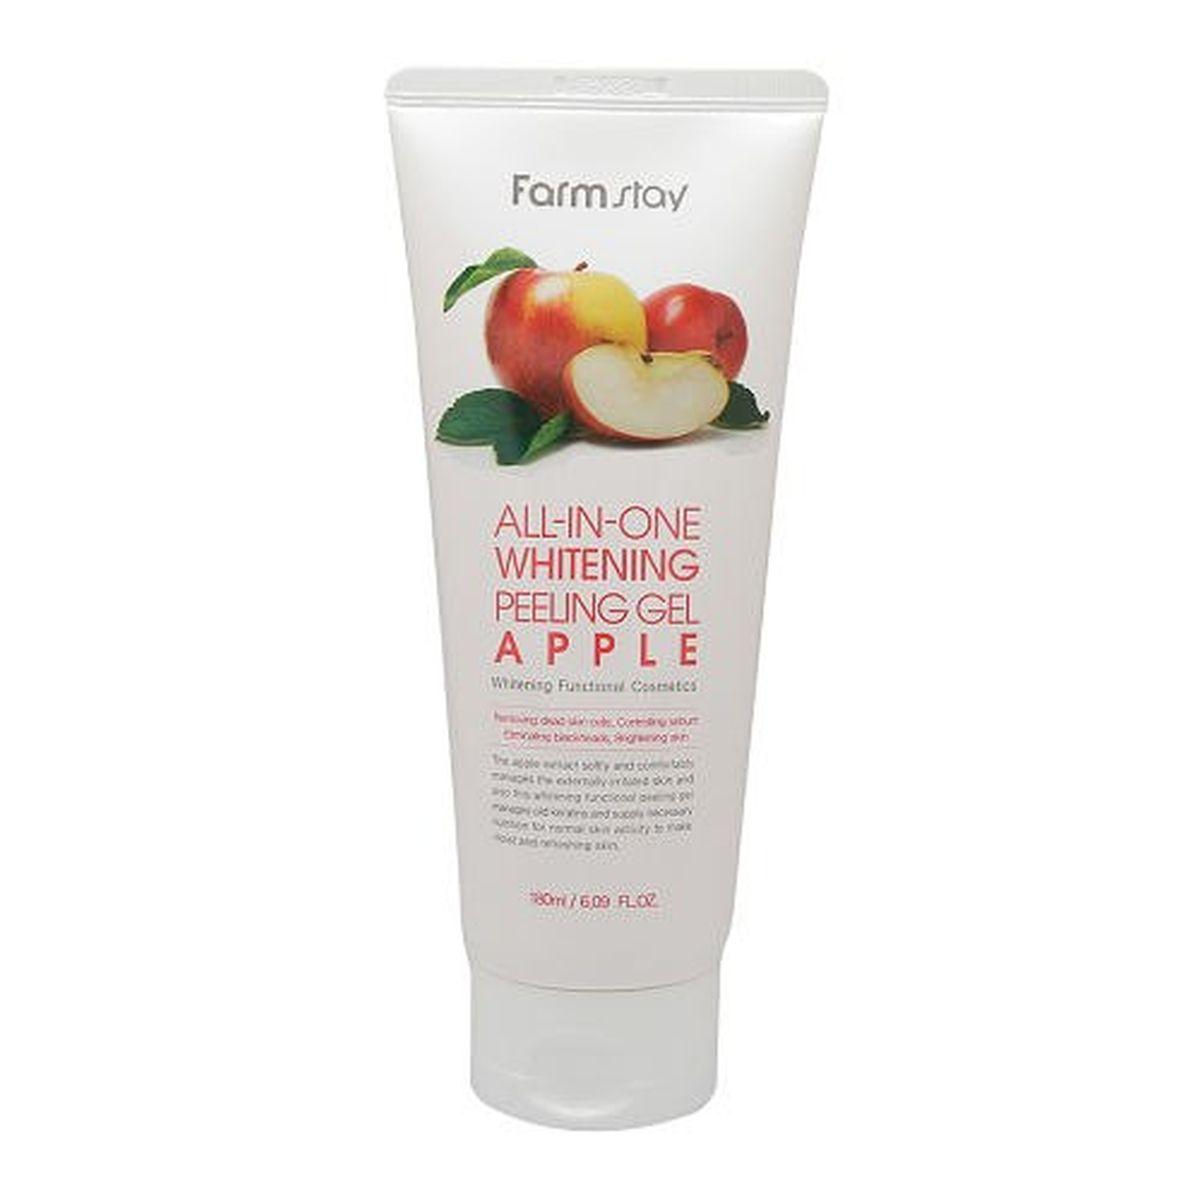 Пилинг-гель с экстрактом яблока FARMSTAY All-In-One Whitening Peeling Gel Apple - 180 мл